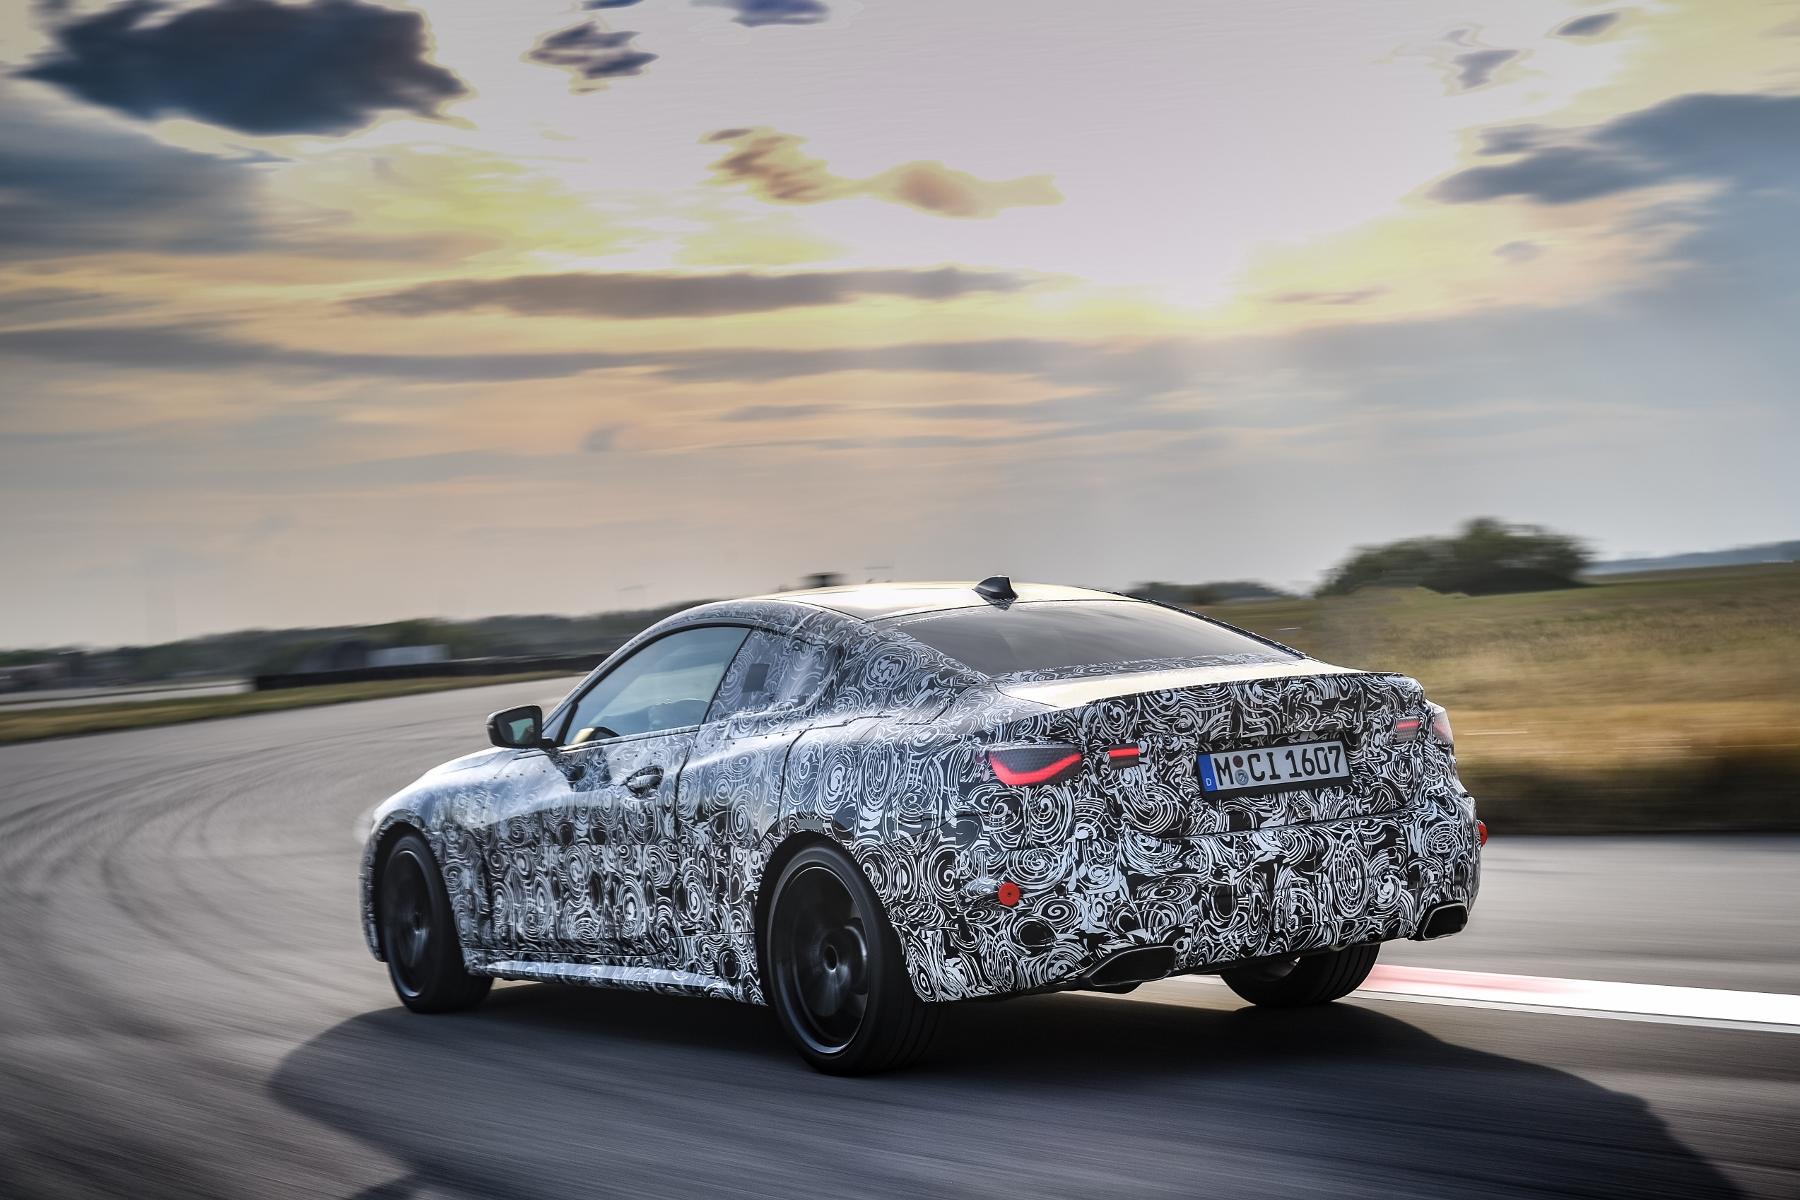 Nové BMW radu 4 Coupé dostane športovejší podvozok 8EVPxaDoRU bmw-4-coupe-7